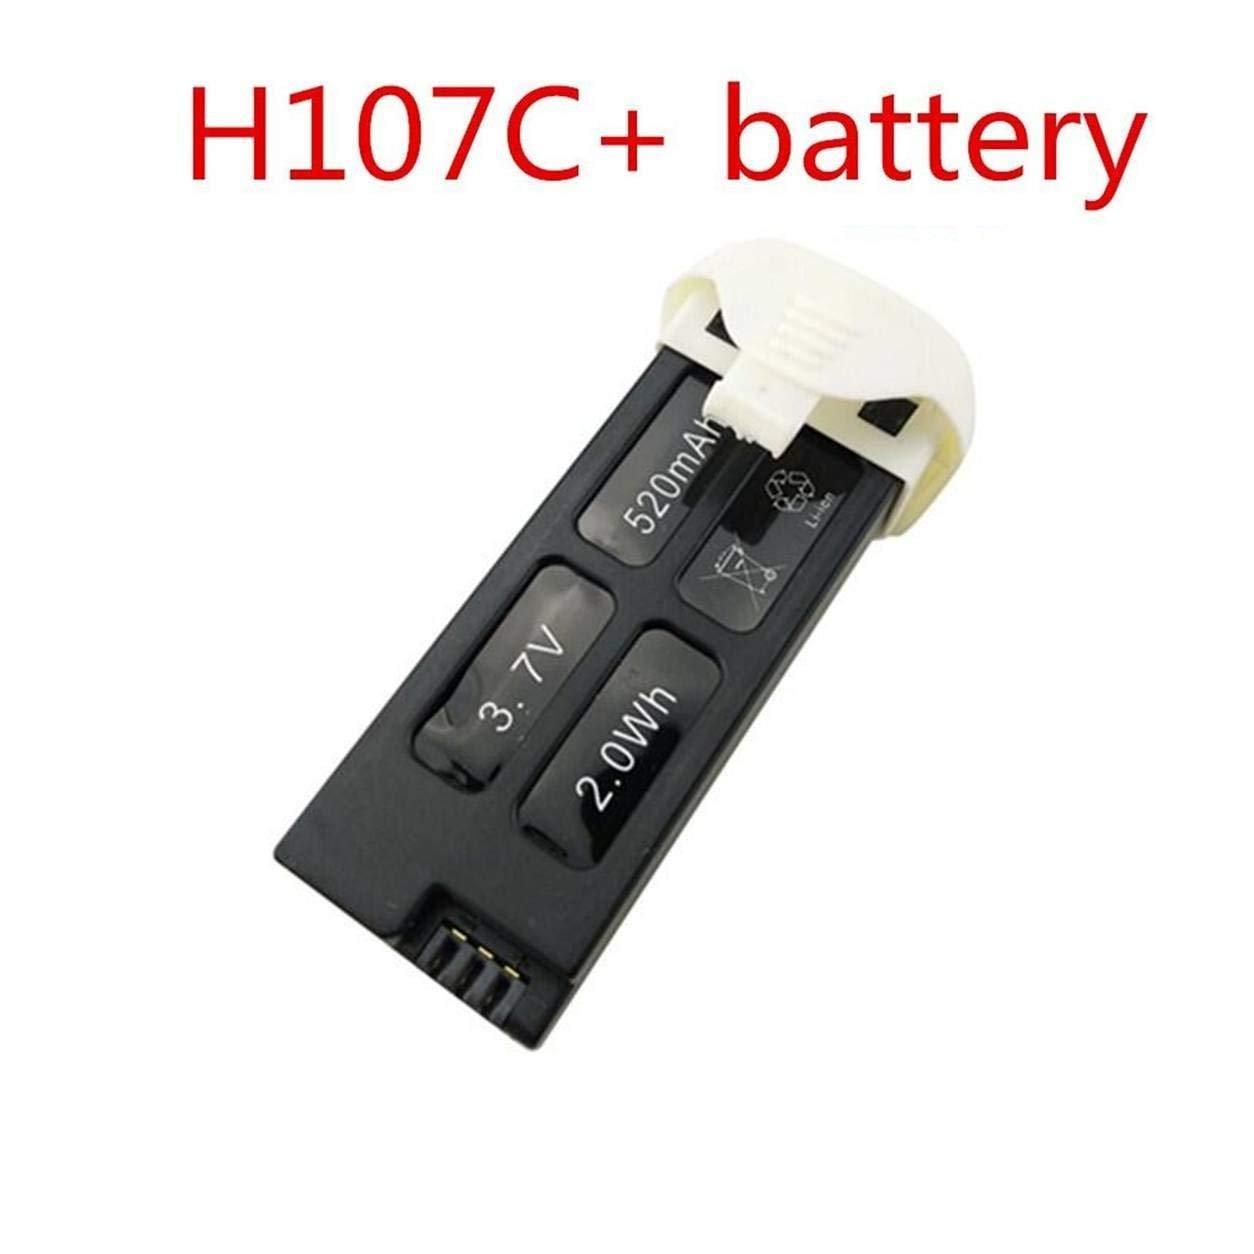 Fytoo 3PCS 3.7V 520mah Lipo Batería para Hubsan X4 H107C + Hubsan ...